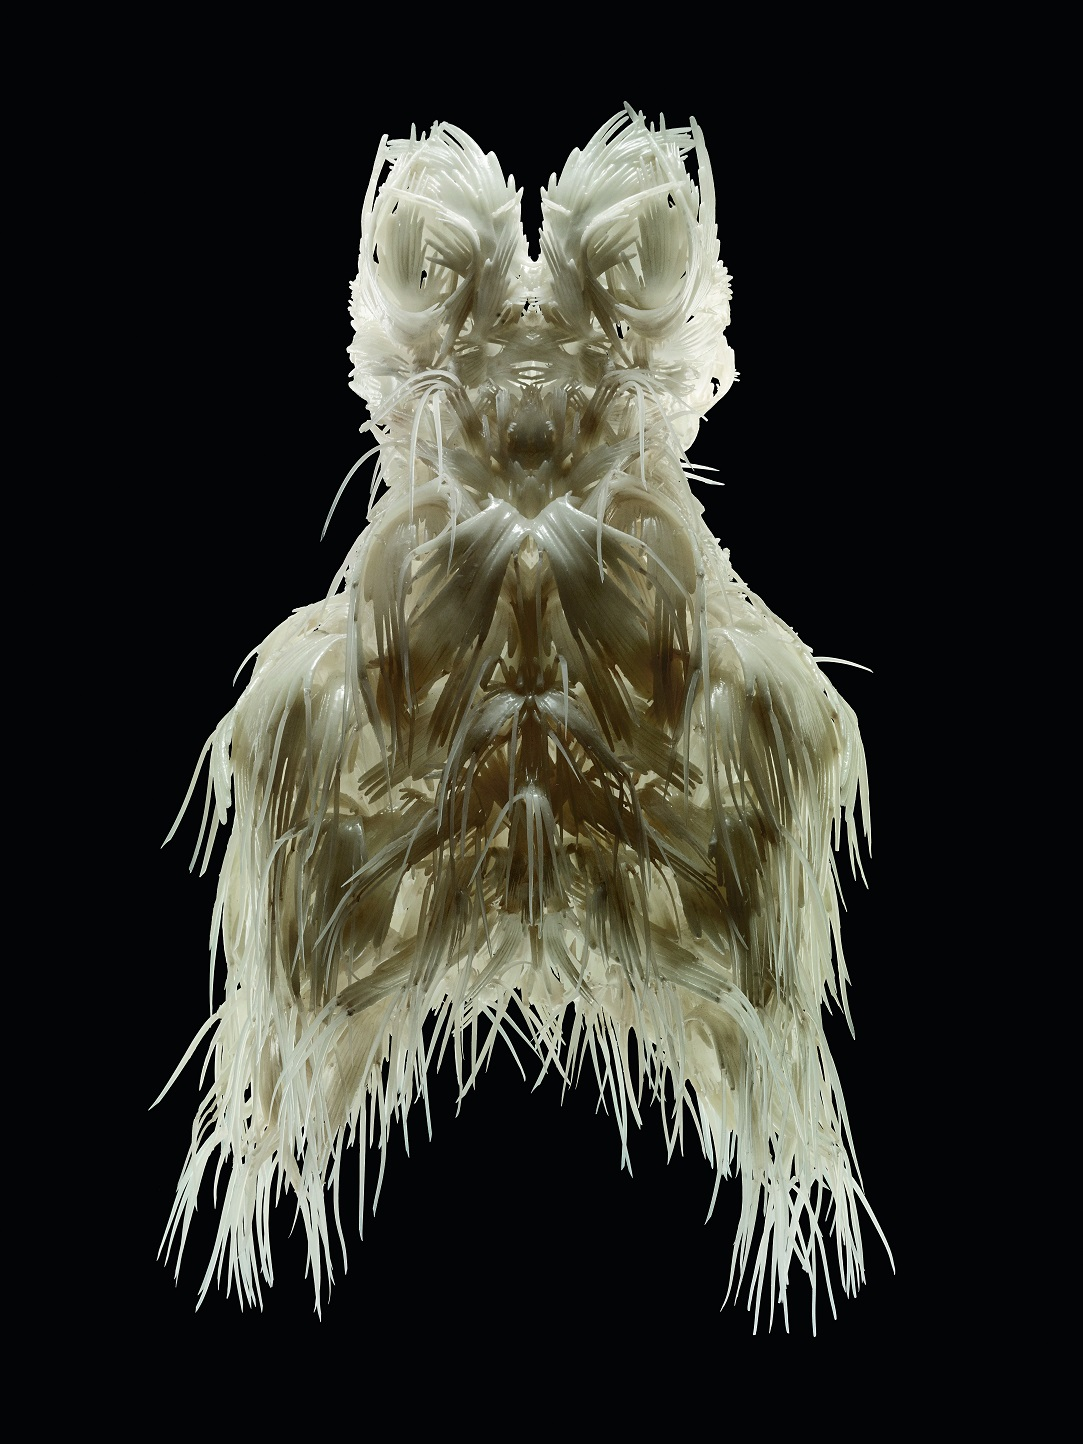 Iris van Herpen (Dutch, born 1984), Biopiracy, Dress, March 2014. 3D-printed TPU 92A-1, silicon coating. Collection of Phoenix Museum of Art. Gift of Arizona Costume Institute. Photo by Bart Oomes, No 6 Studios. © Iris van Herpen.